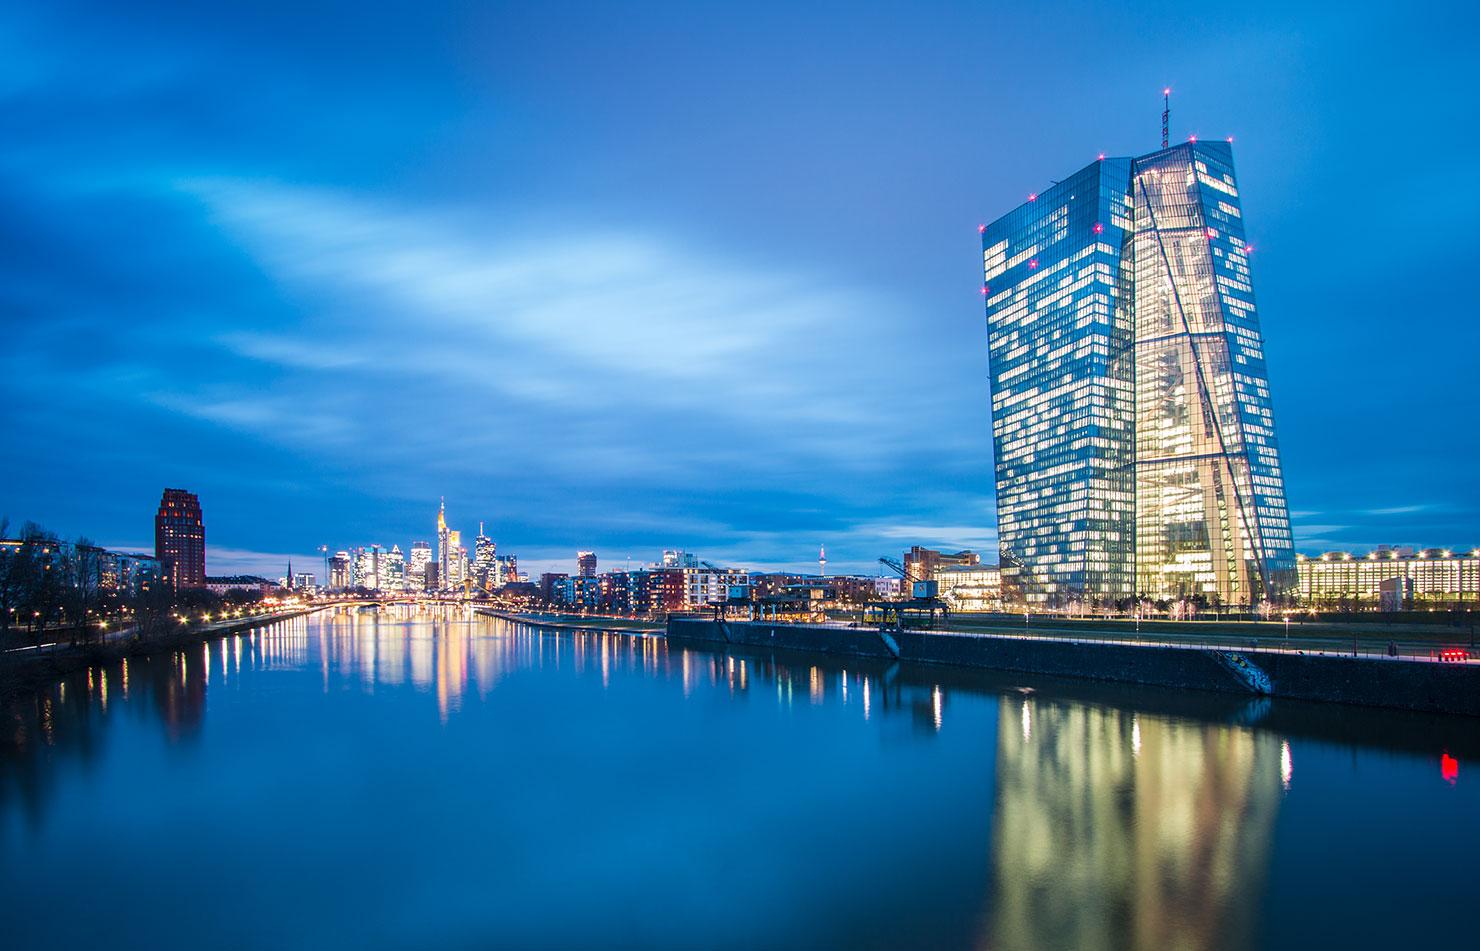 Frankfurt EZB Skyline Nacht